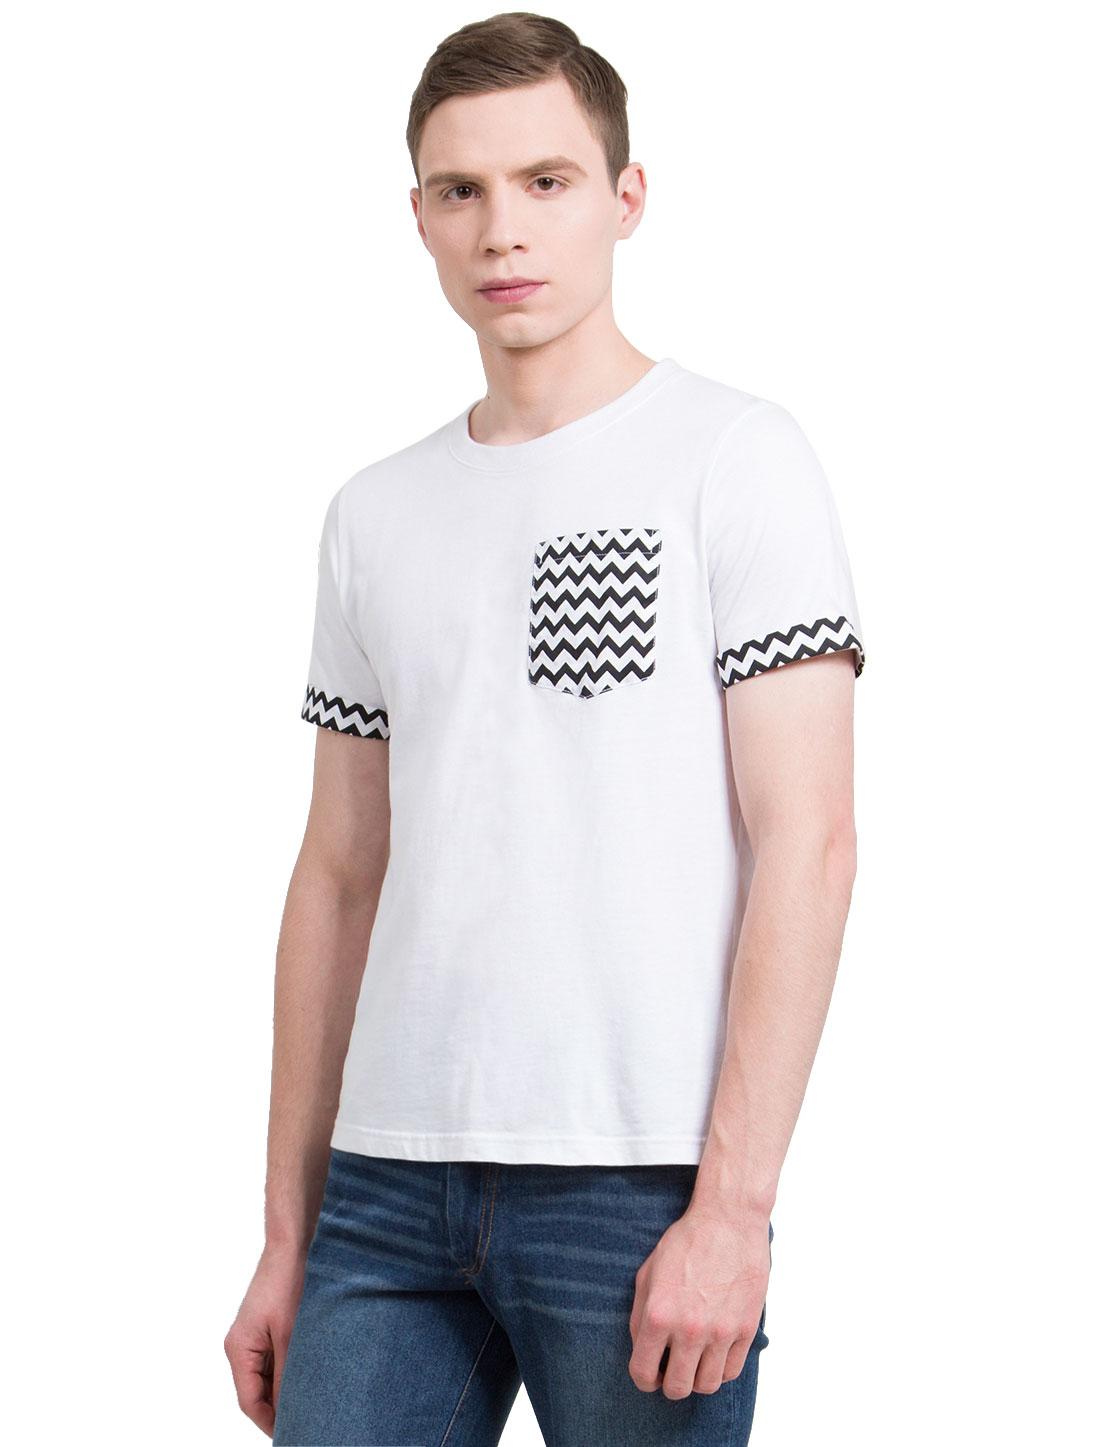 Man Crew Neck Short-Sleeved Cotton Chevron Tee Shirt White L